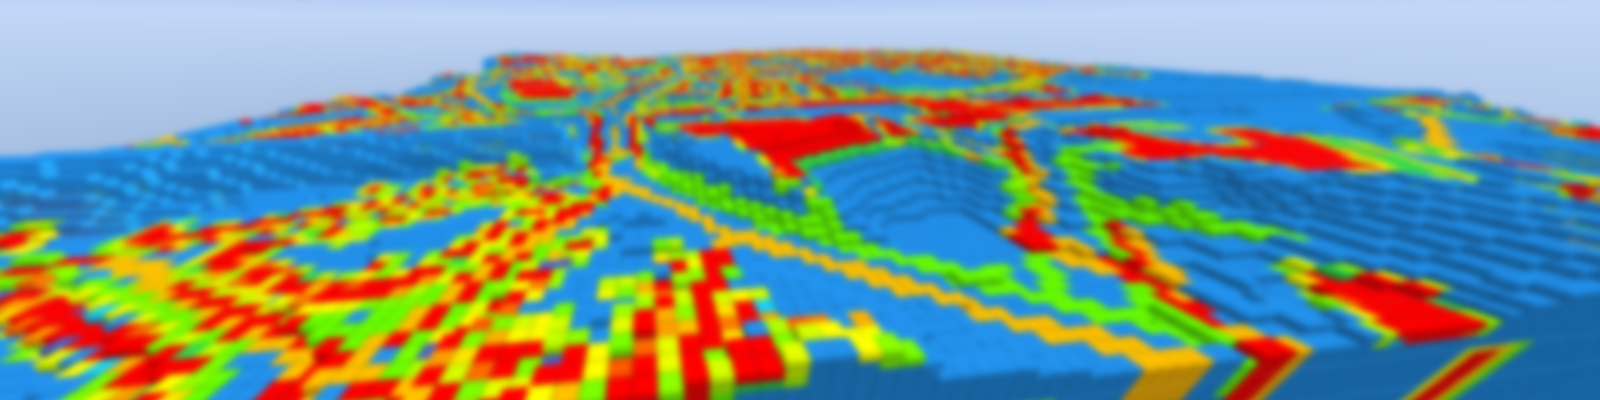 GeoScene3D   3D Modelling   GeoScene